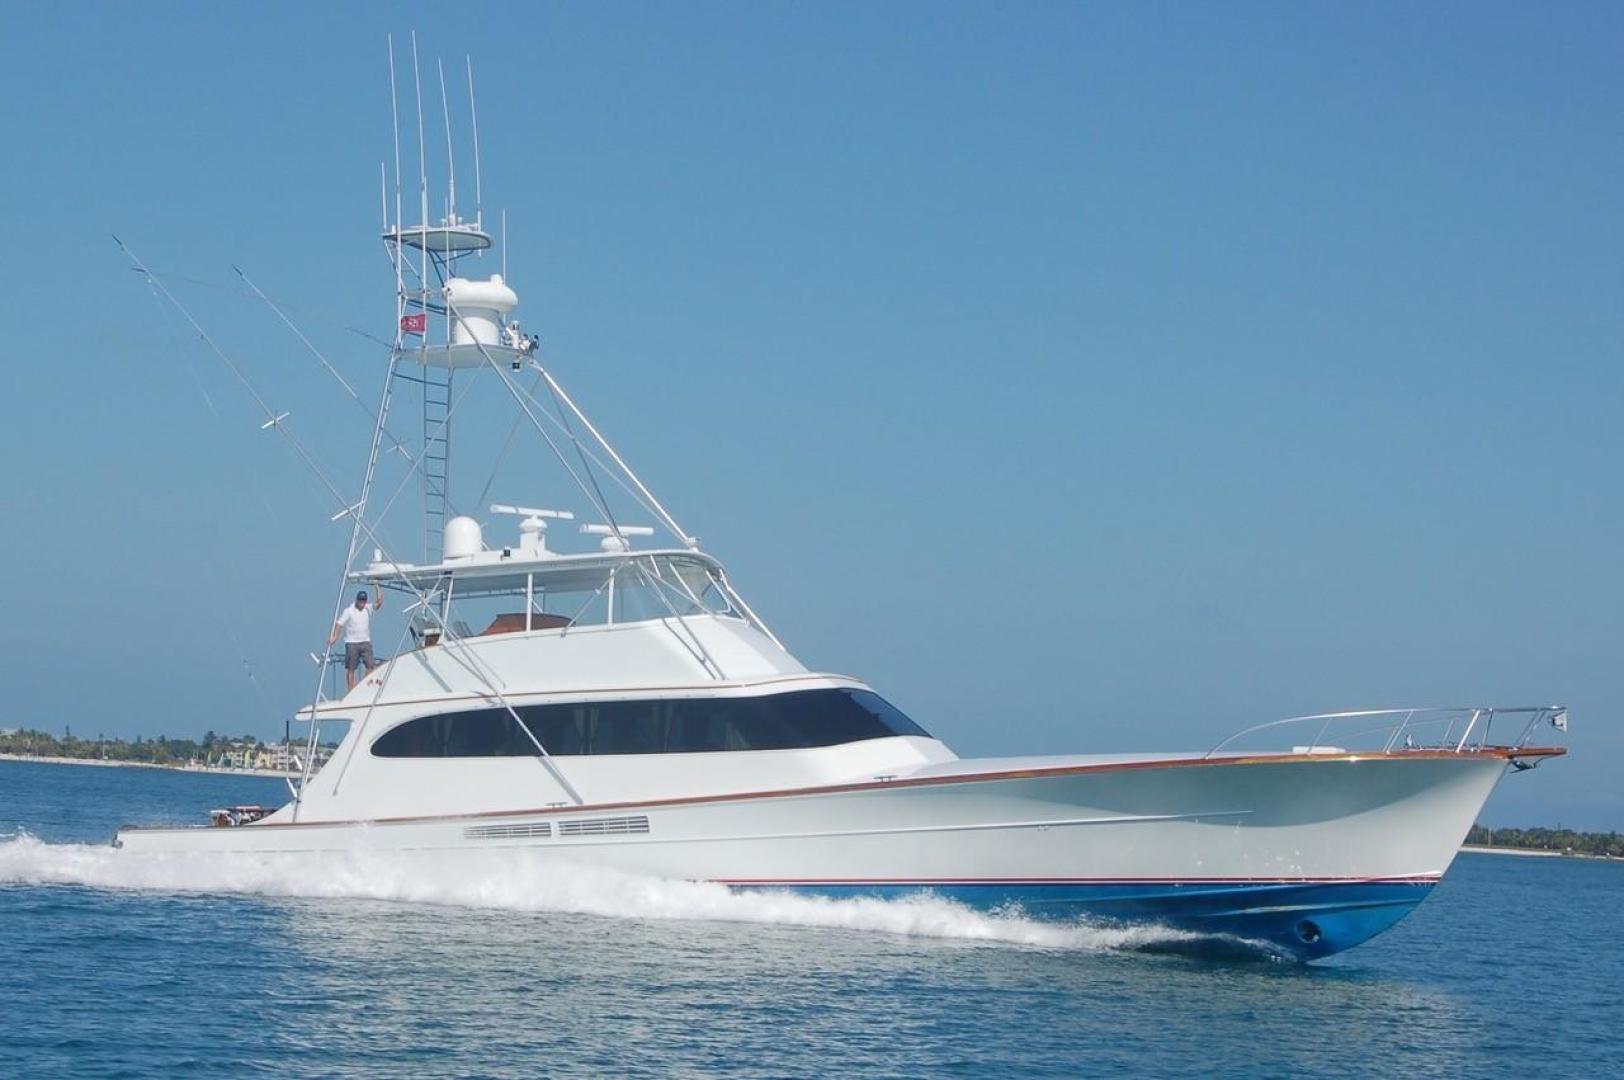 75' Merritt Sportfish